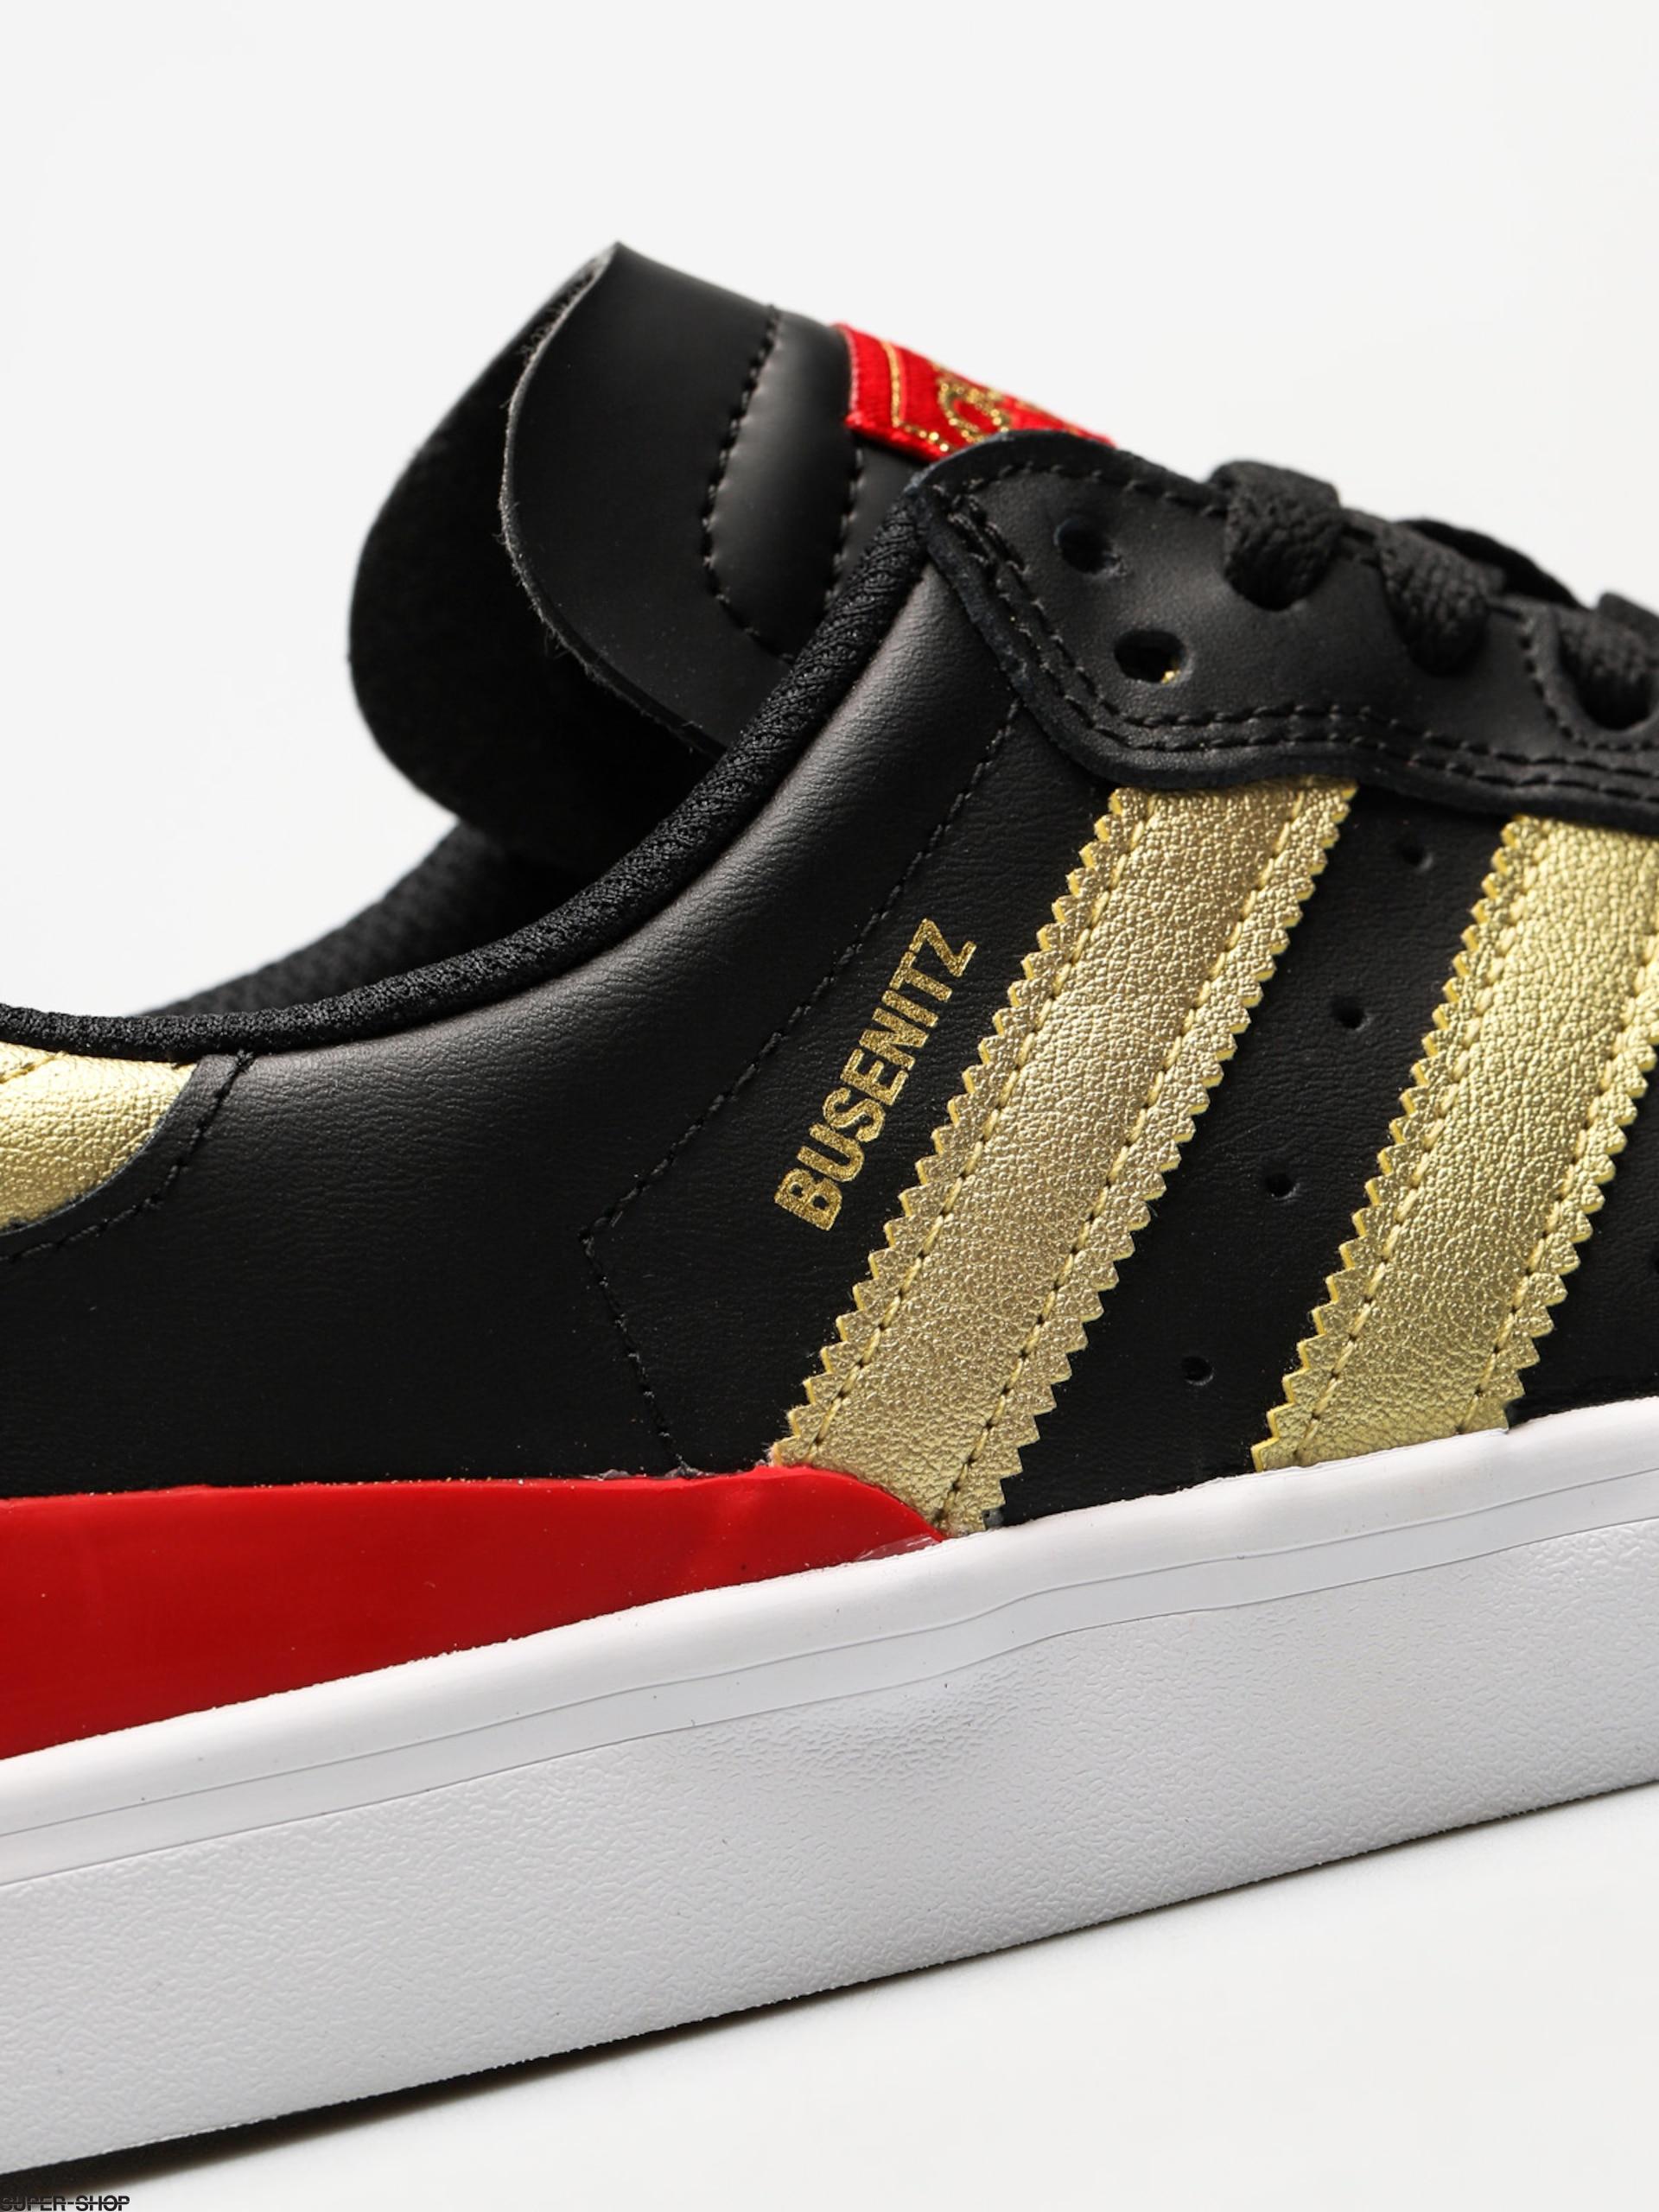 Rxcore scarlet Met Vulc Blackgold Adidas Shoes Busenitz b7gf6yYv